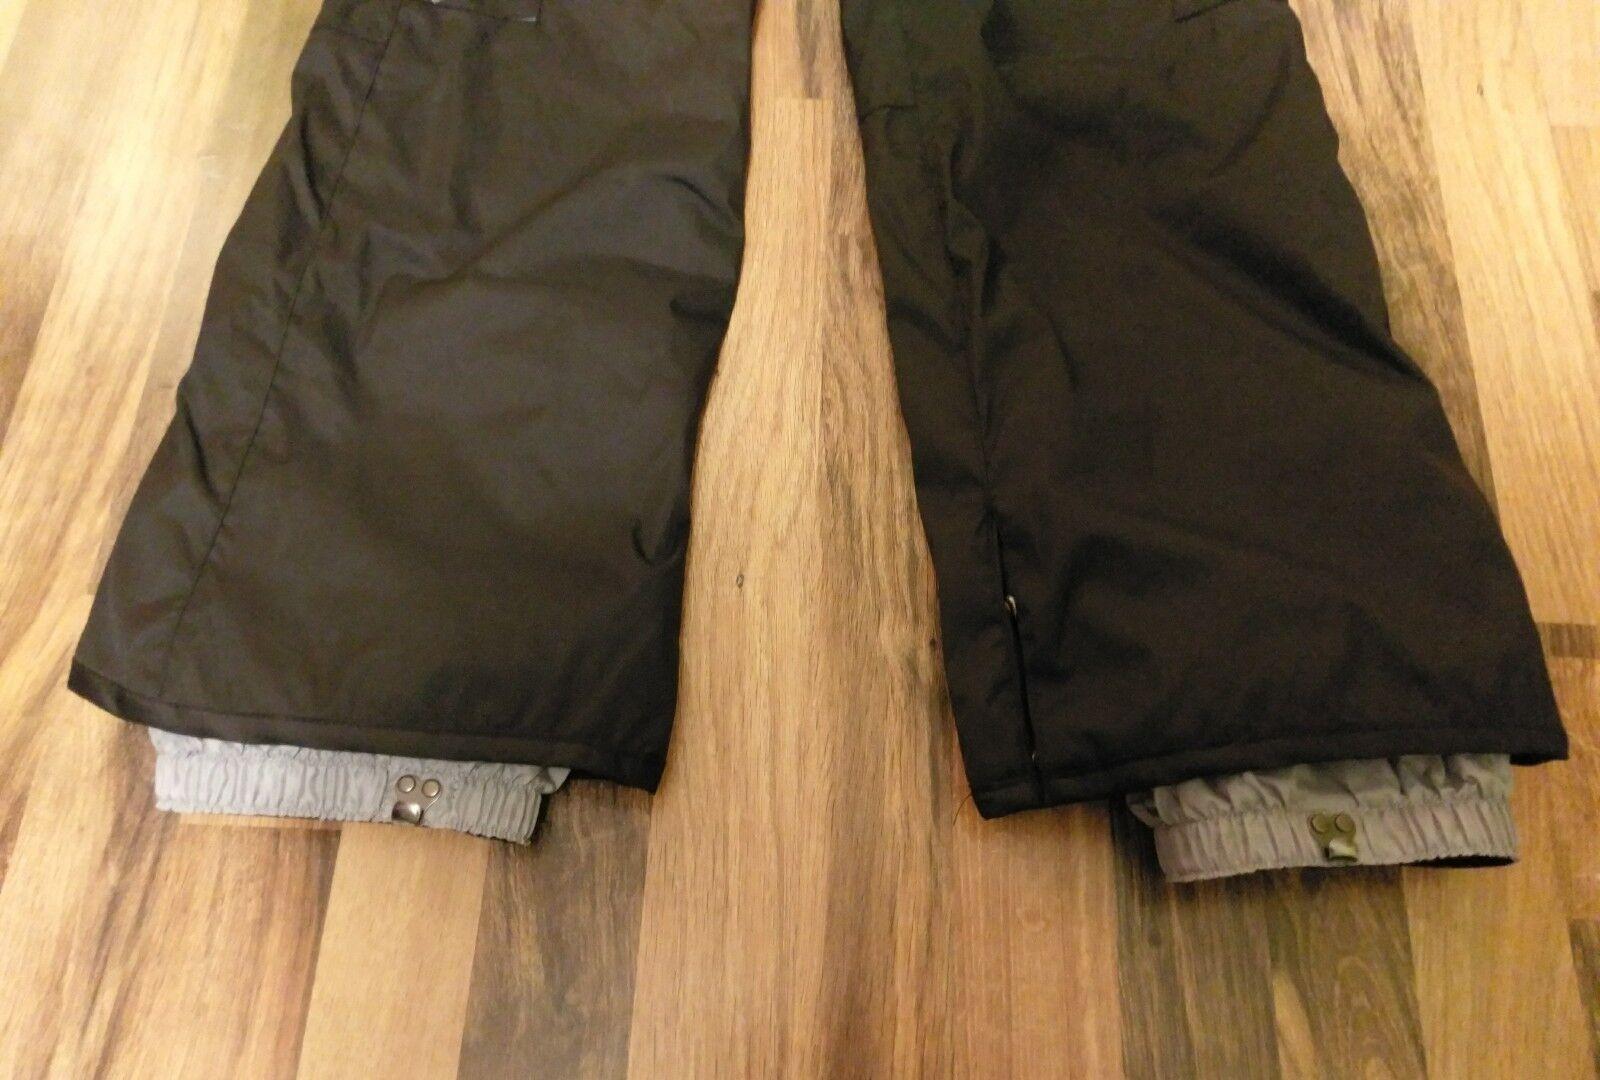 Children ski snowboard trousers trousers snowboard Größe S DC Pascal, London  B382 396c39